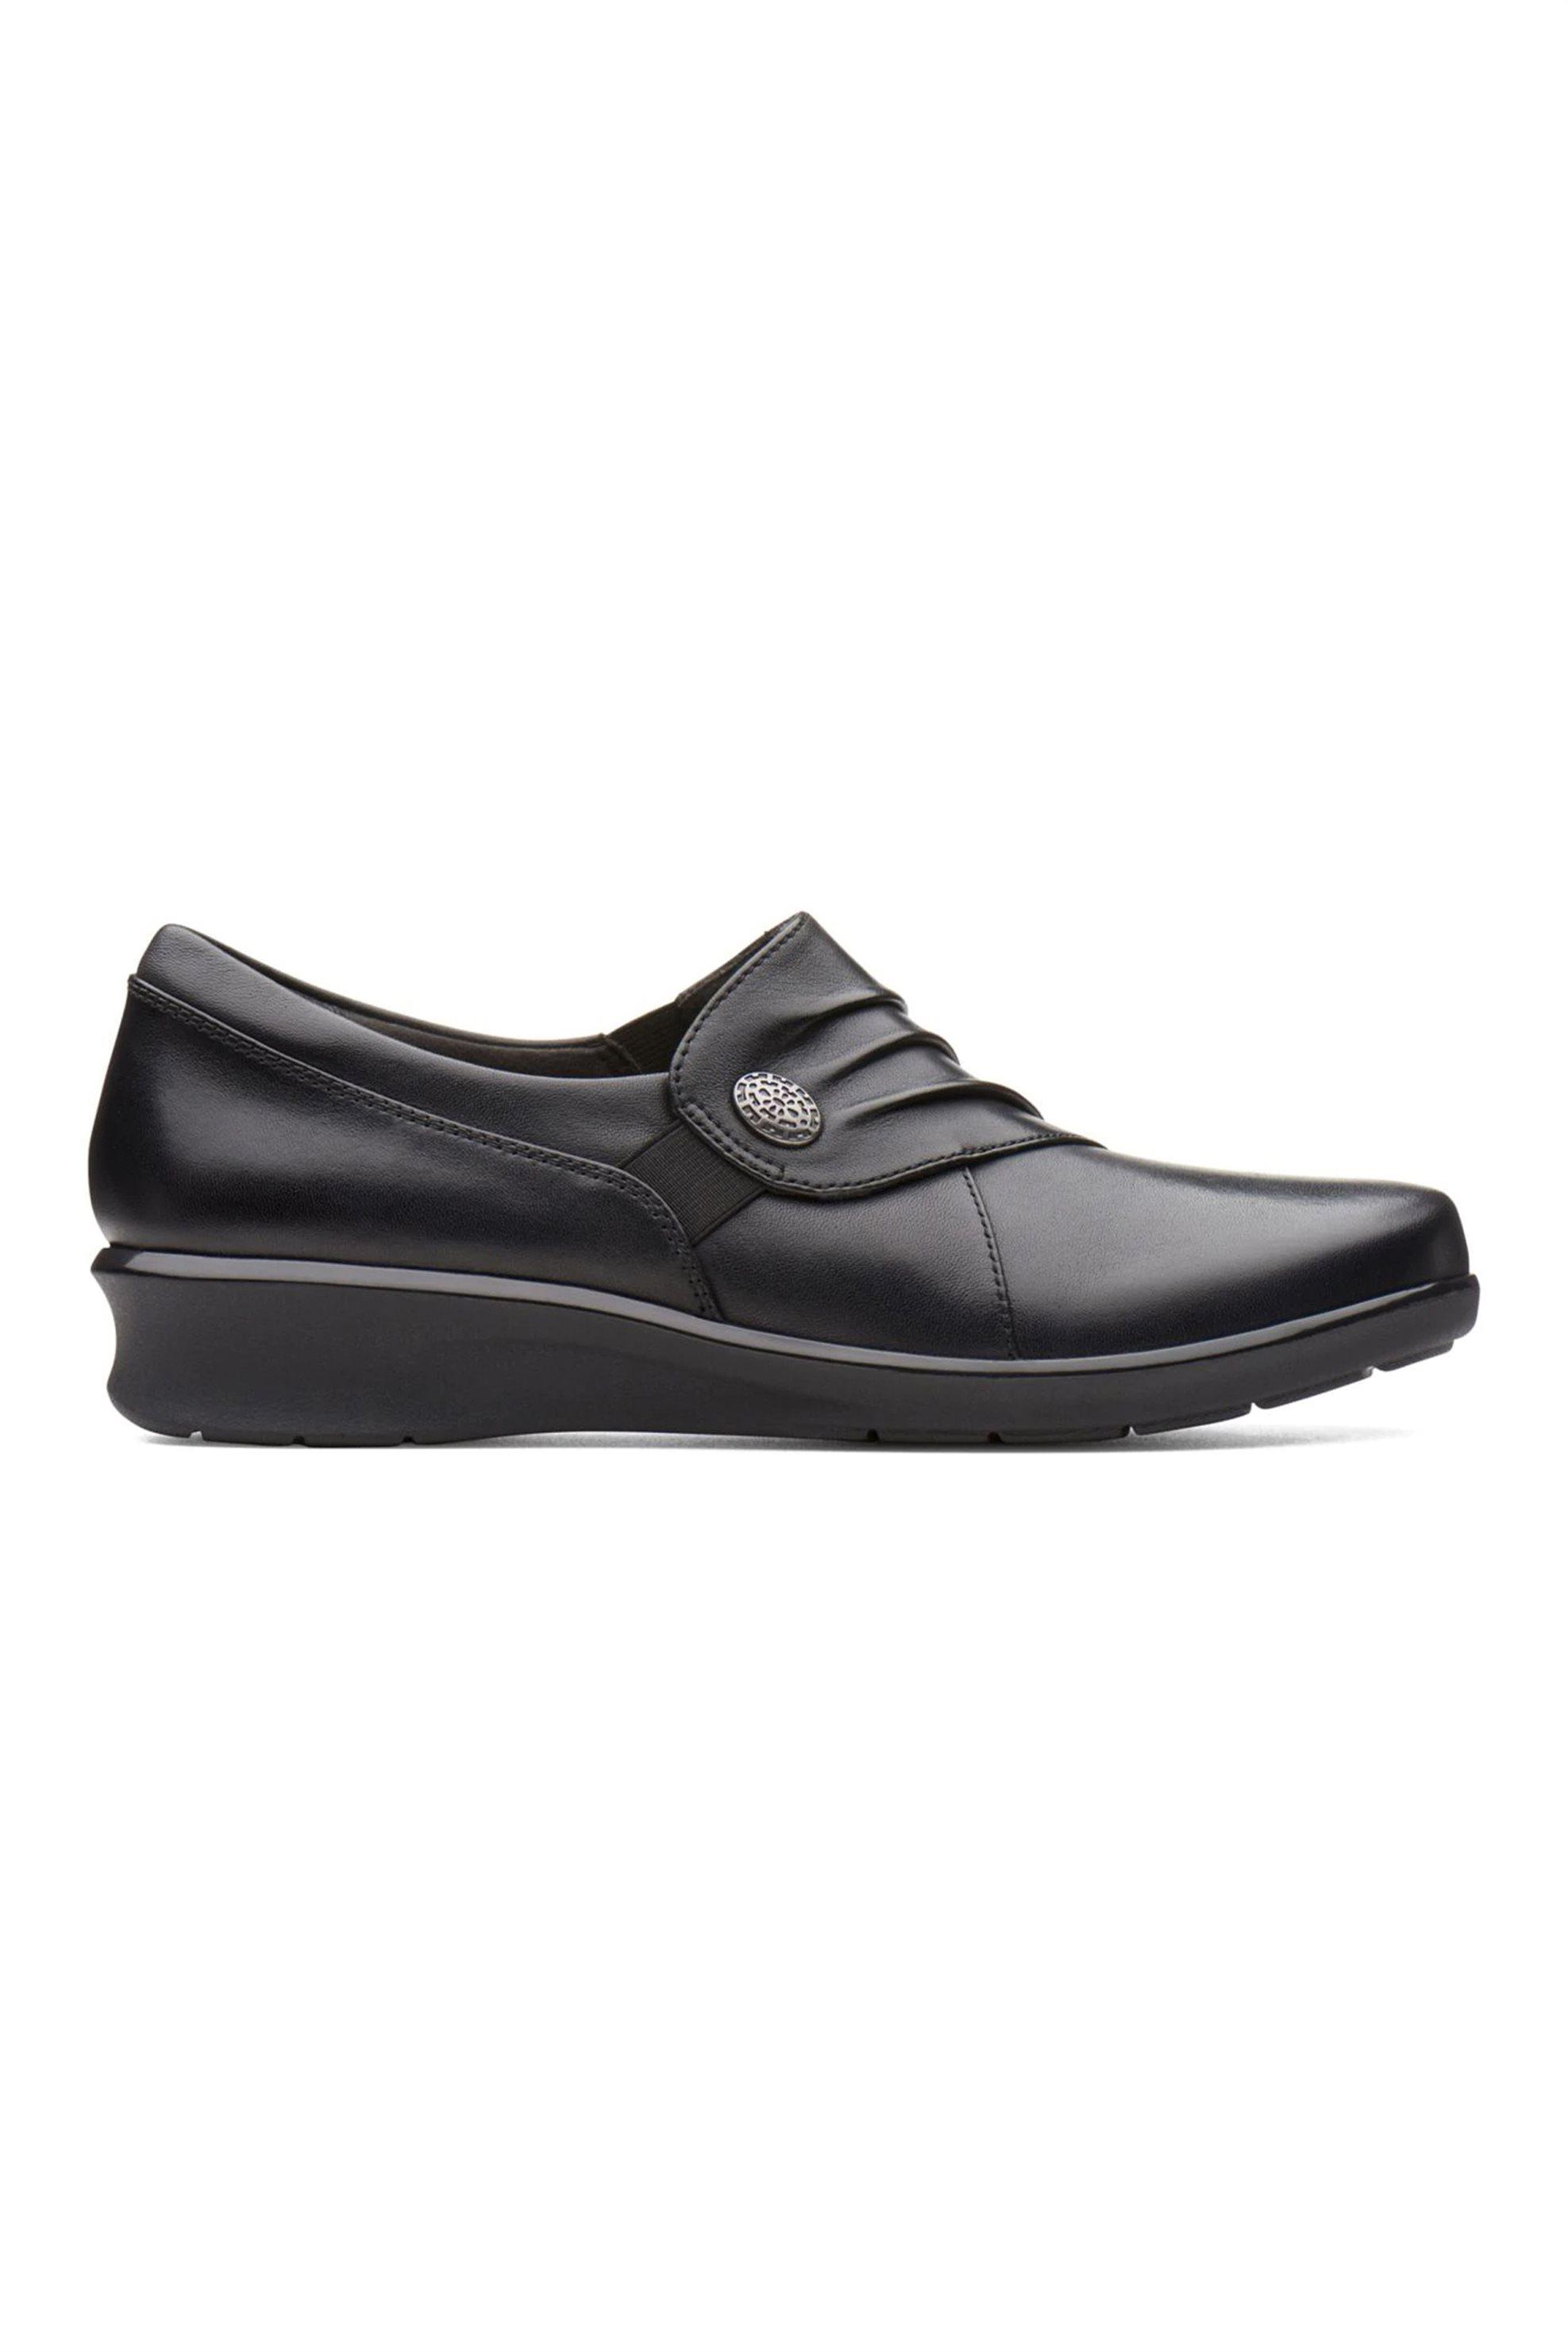 Clarks γυναικεία παπούτσια με σούρα και κουμπί «Hope Roxanne» – 26137200 – Μαύρο